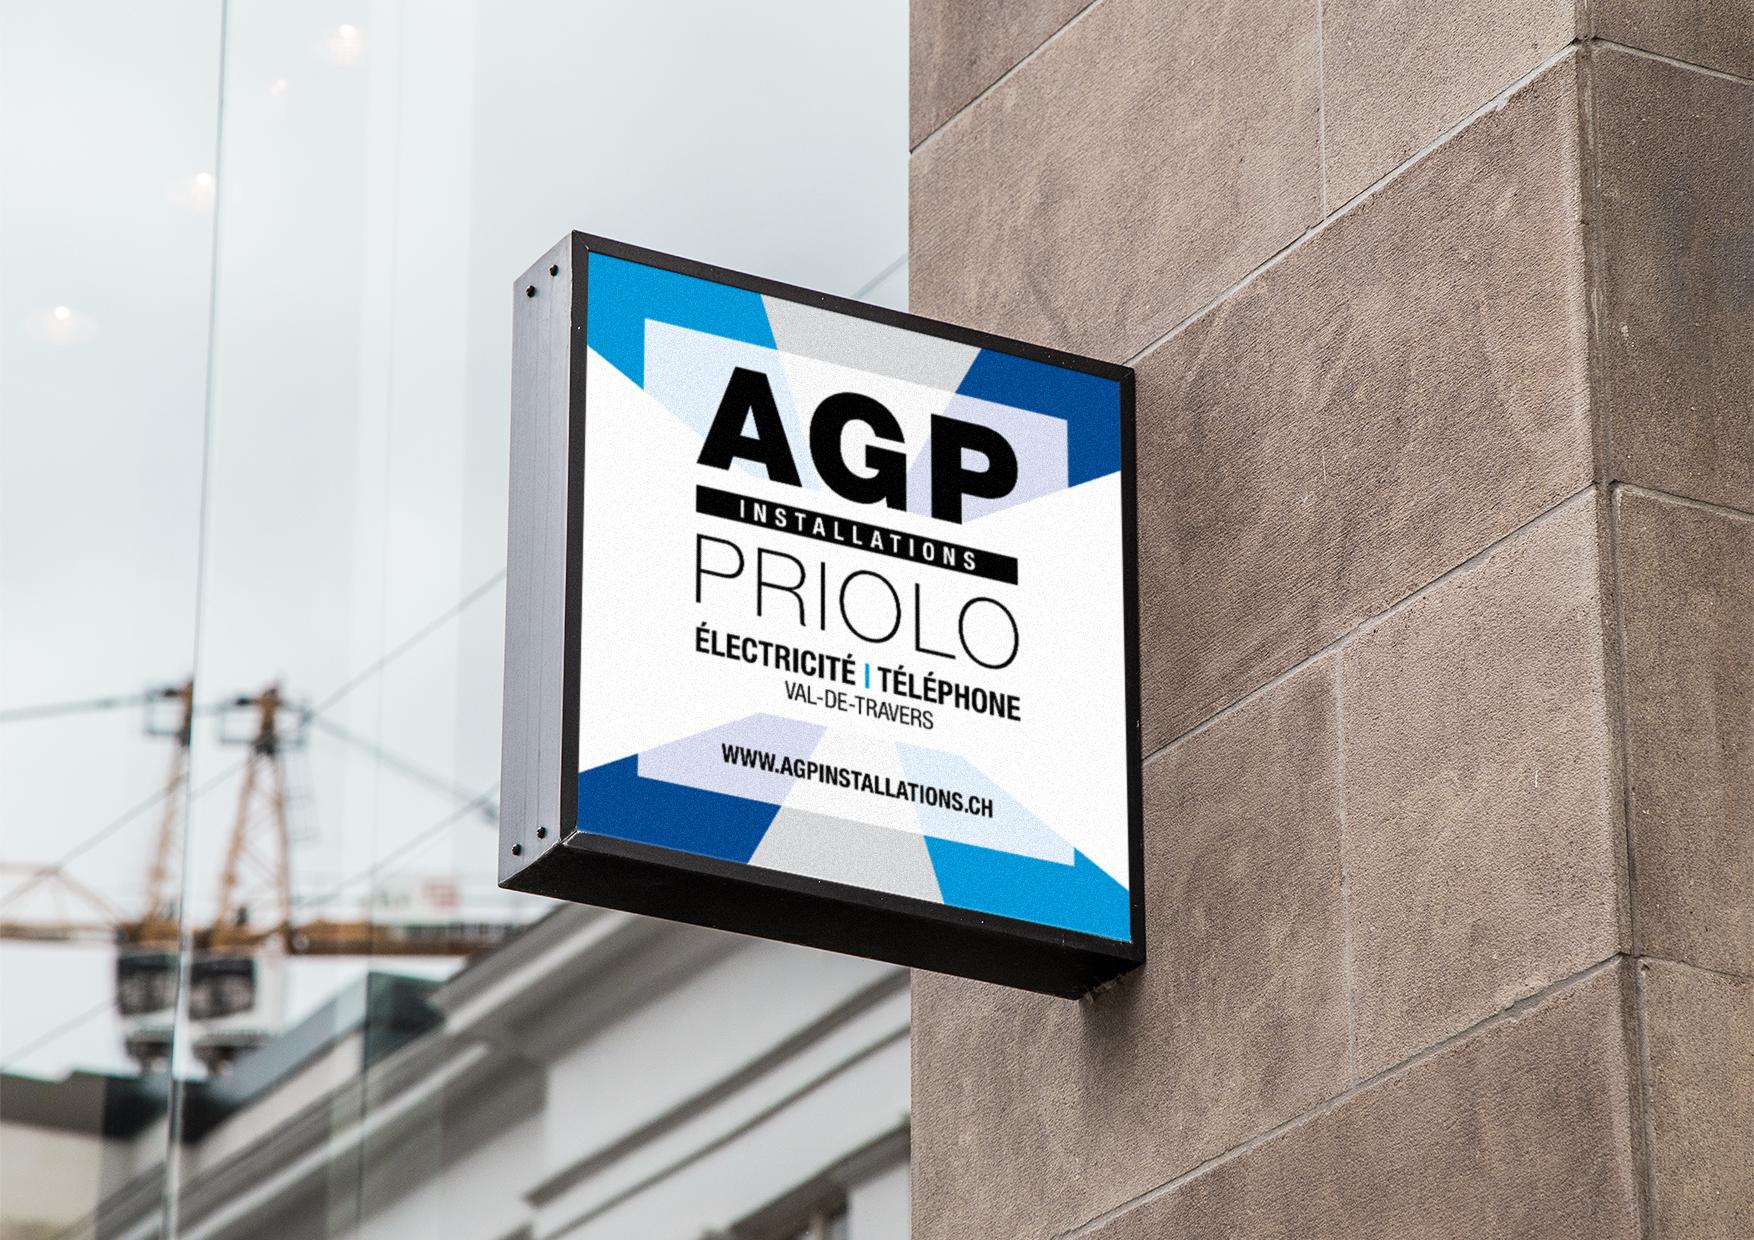 AGP INSTALLATIONS PRIOLO